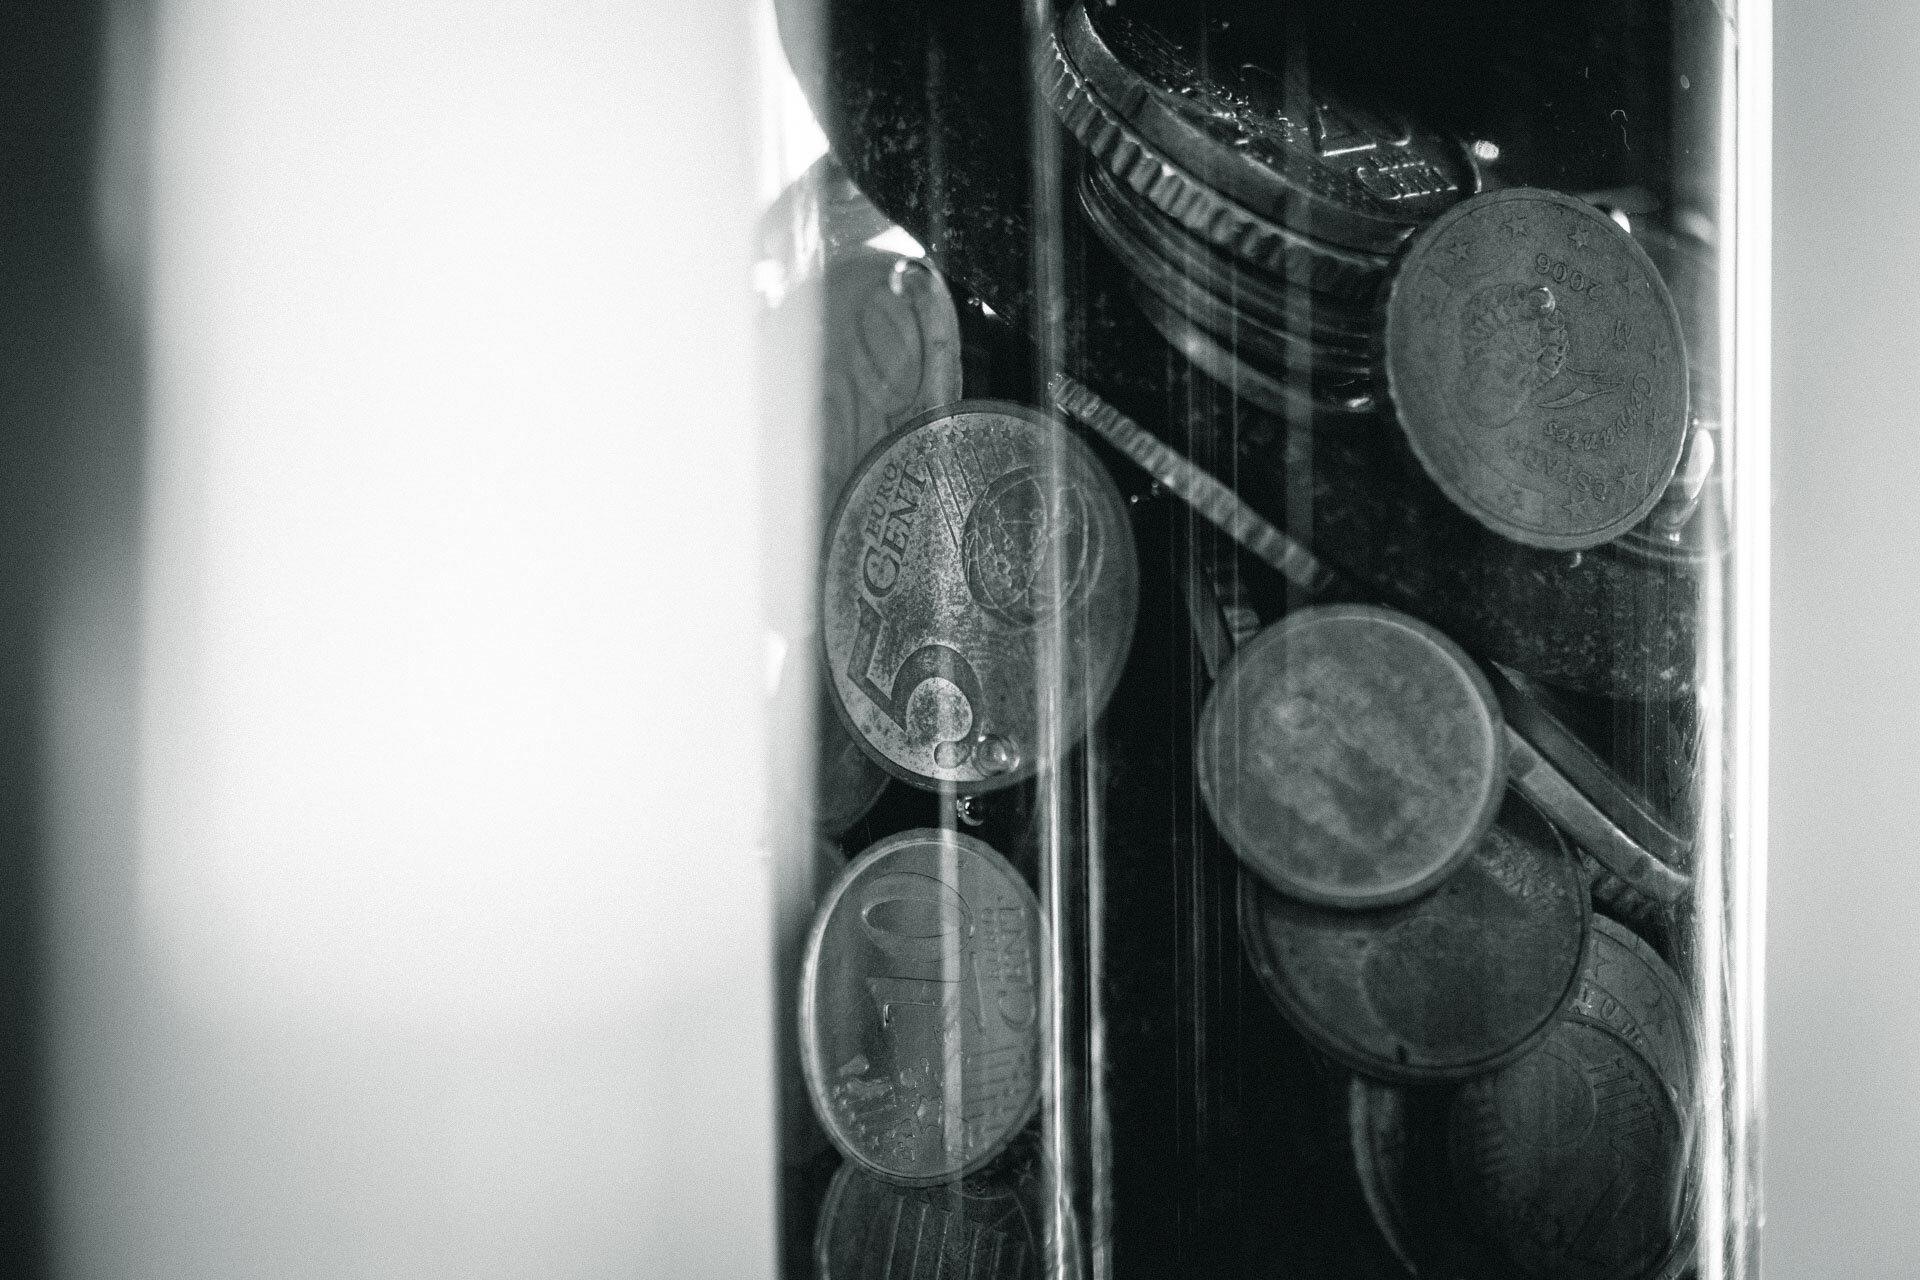 BPP 12 - Coins - IG-1.jpg